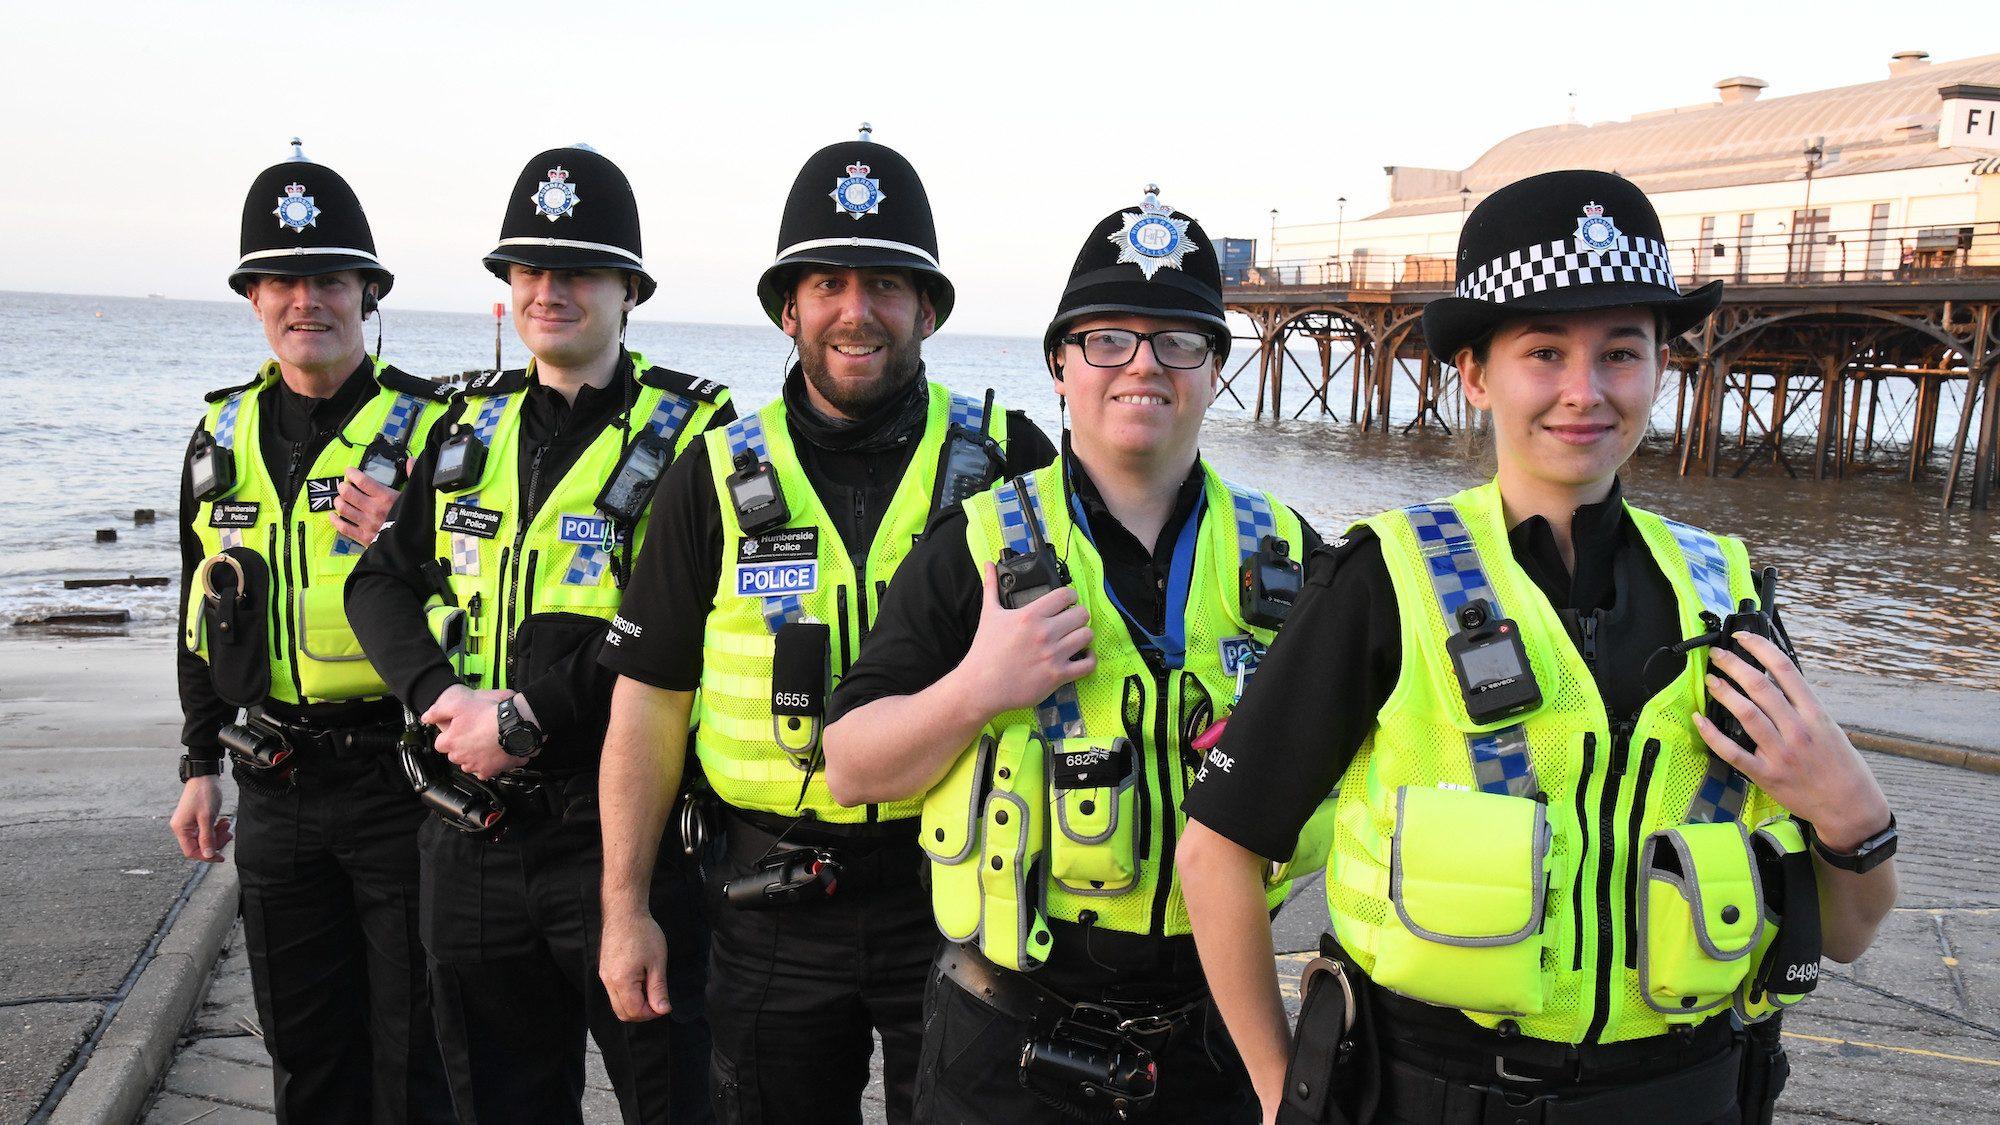 A team of special constables